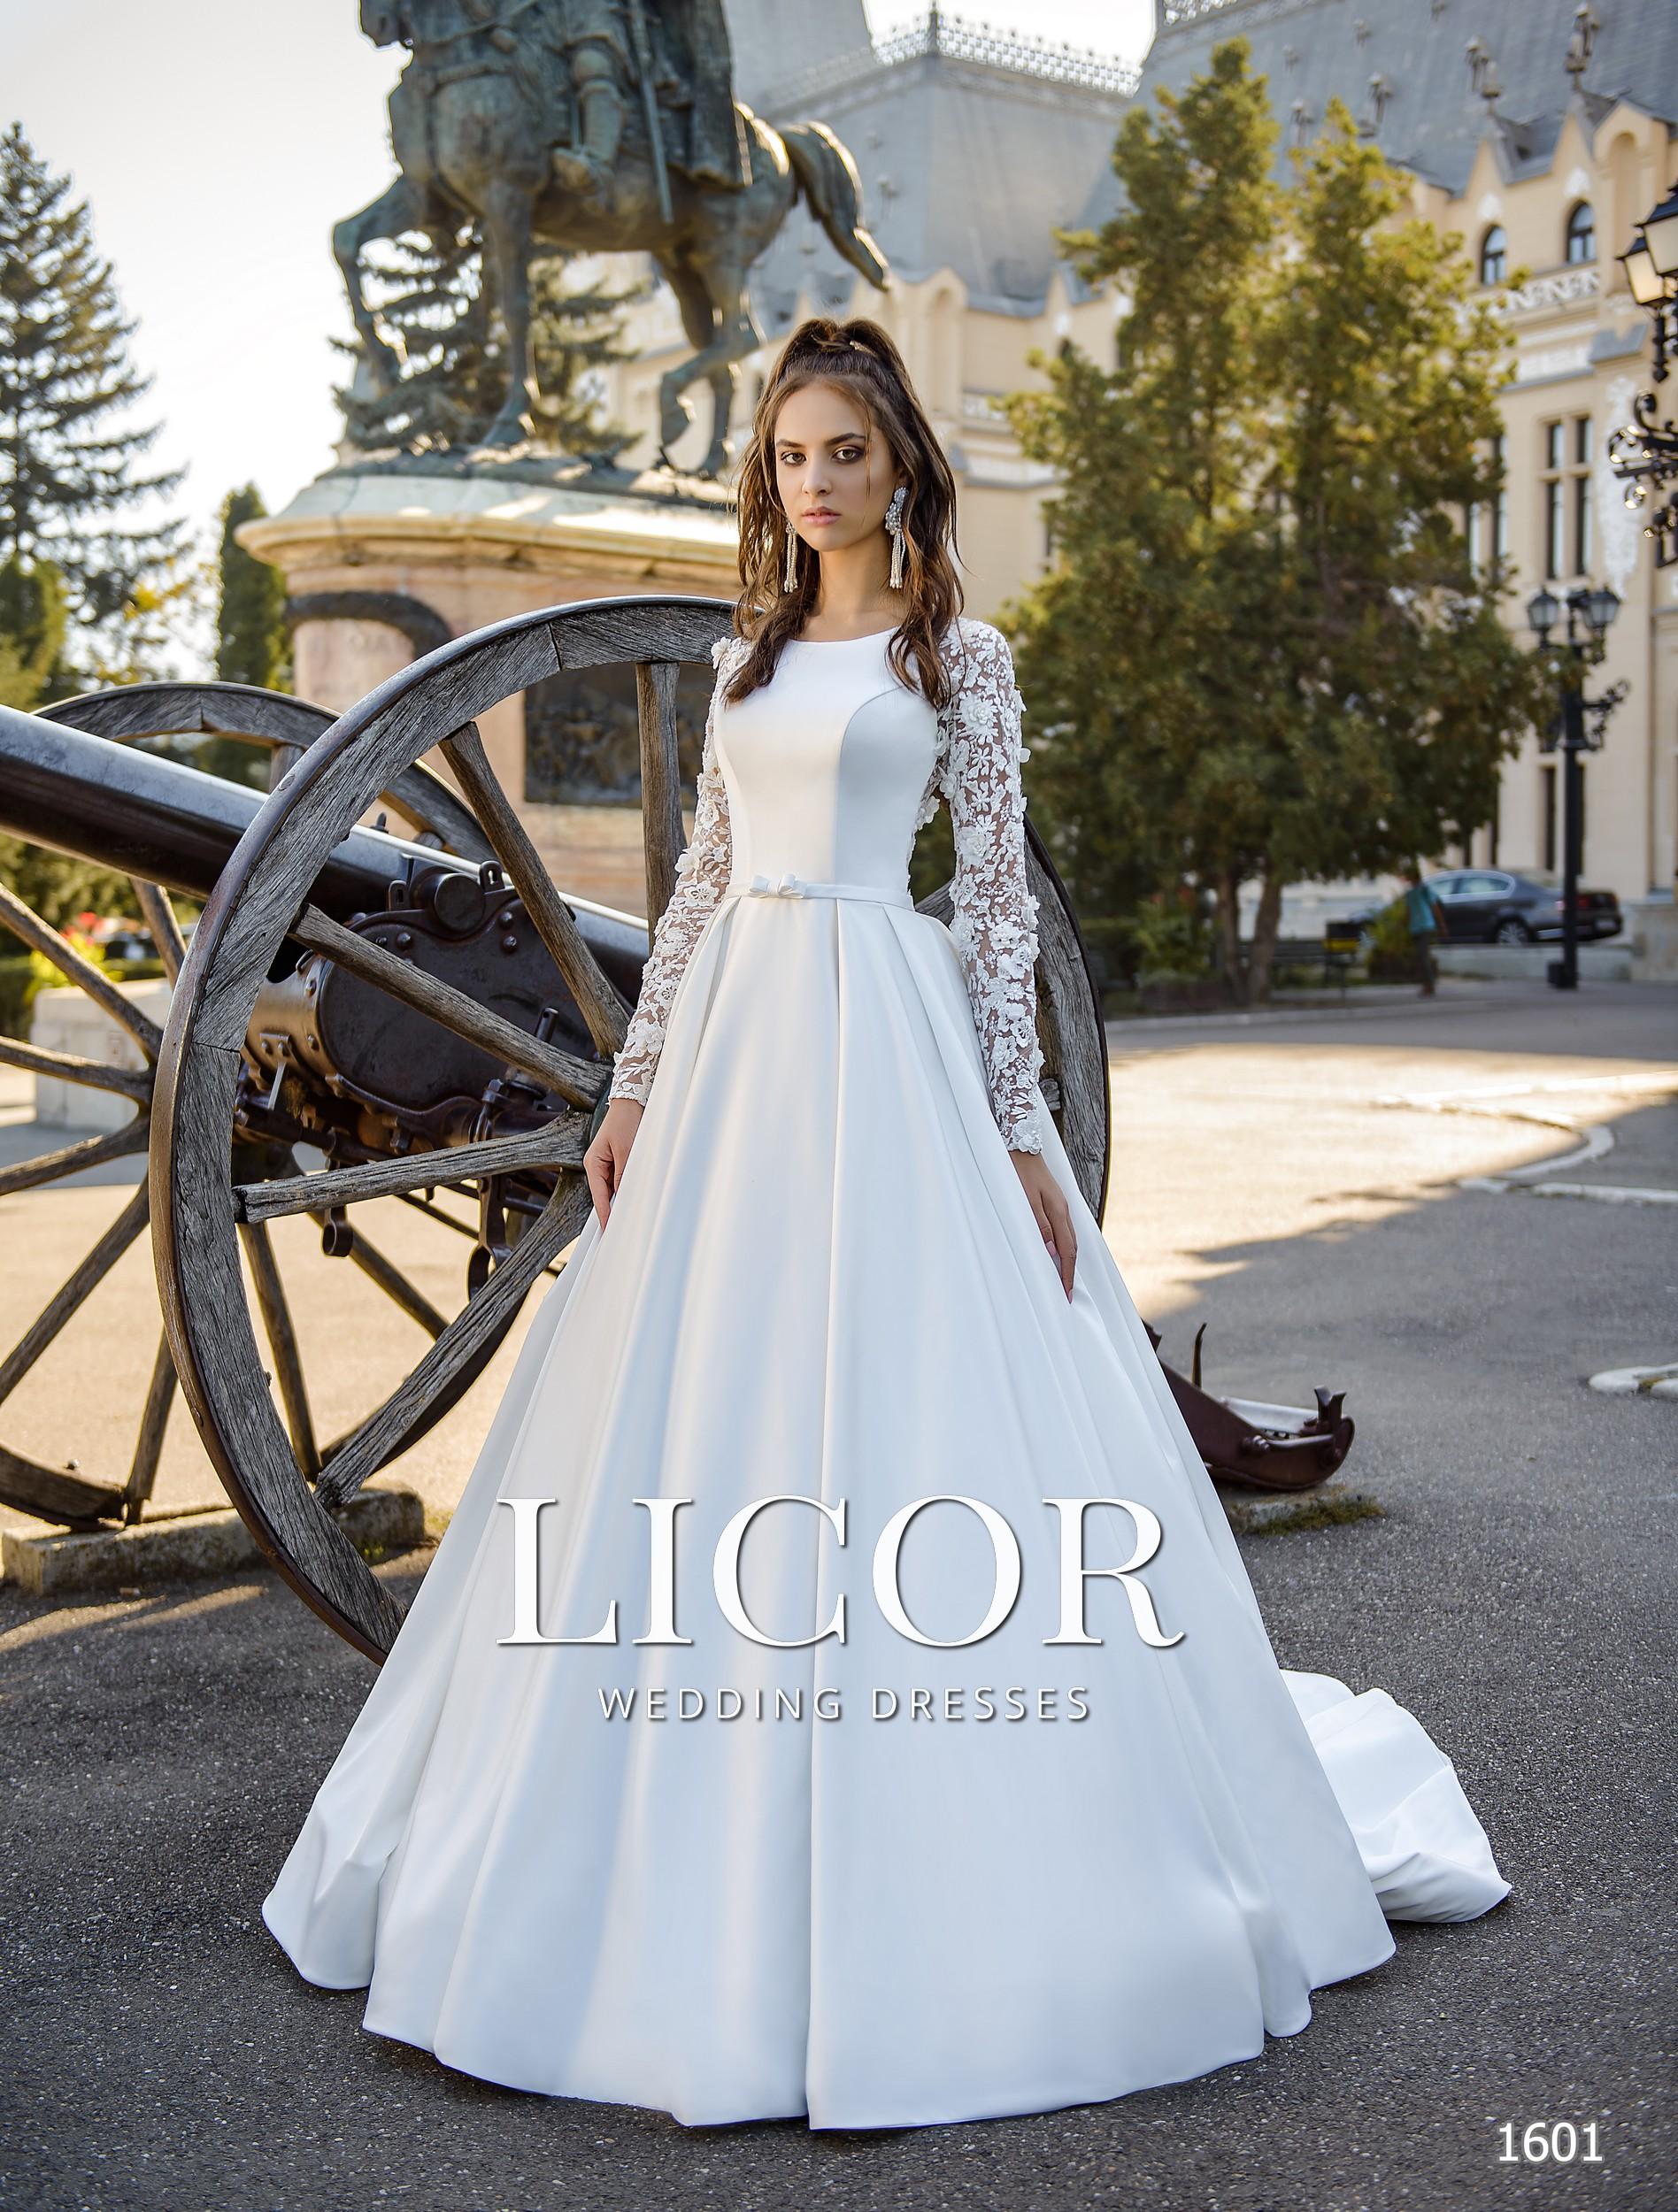 http://licor.com.ua/images/stories/virtuemart/product/1601(1).jpg